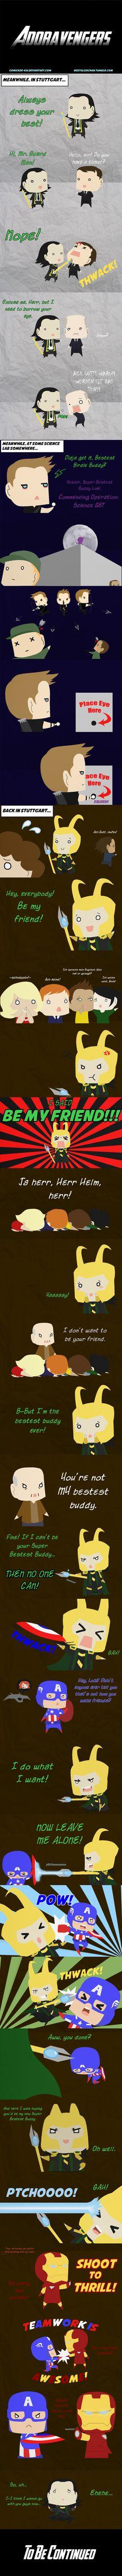 Adoravengers: Scene Eight by Comicker-Kai.deviantart.com on @deviantART